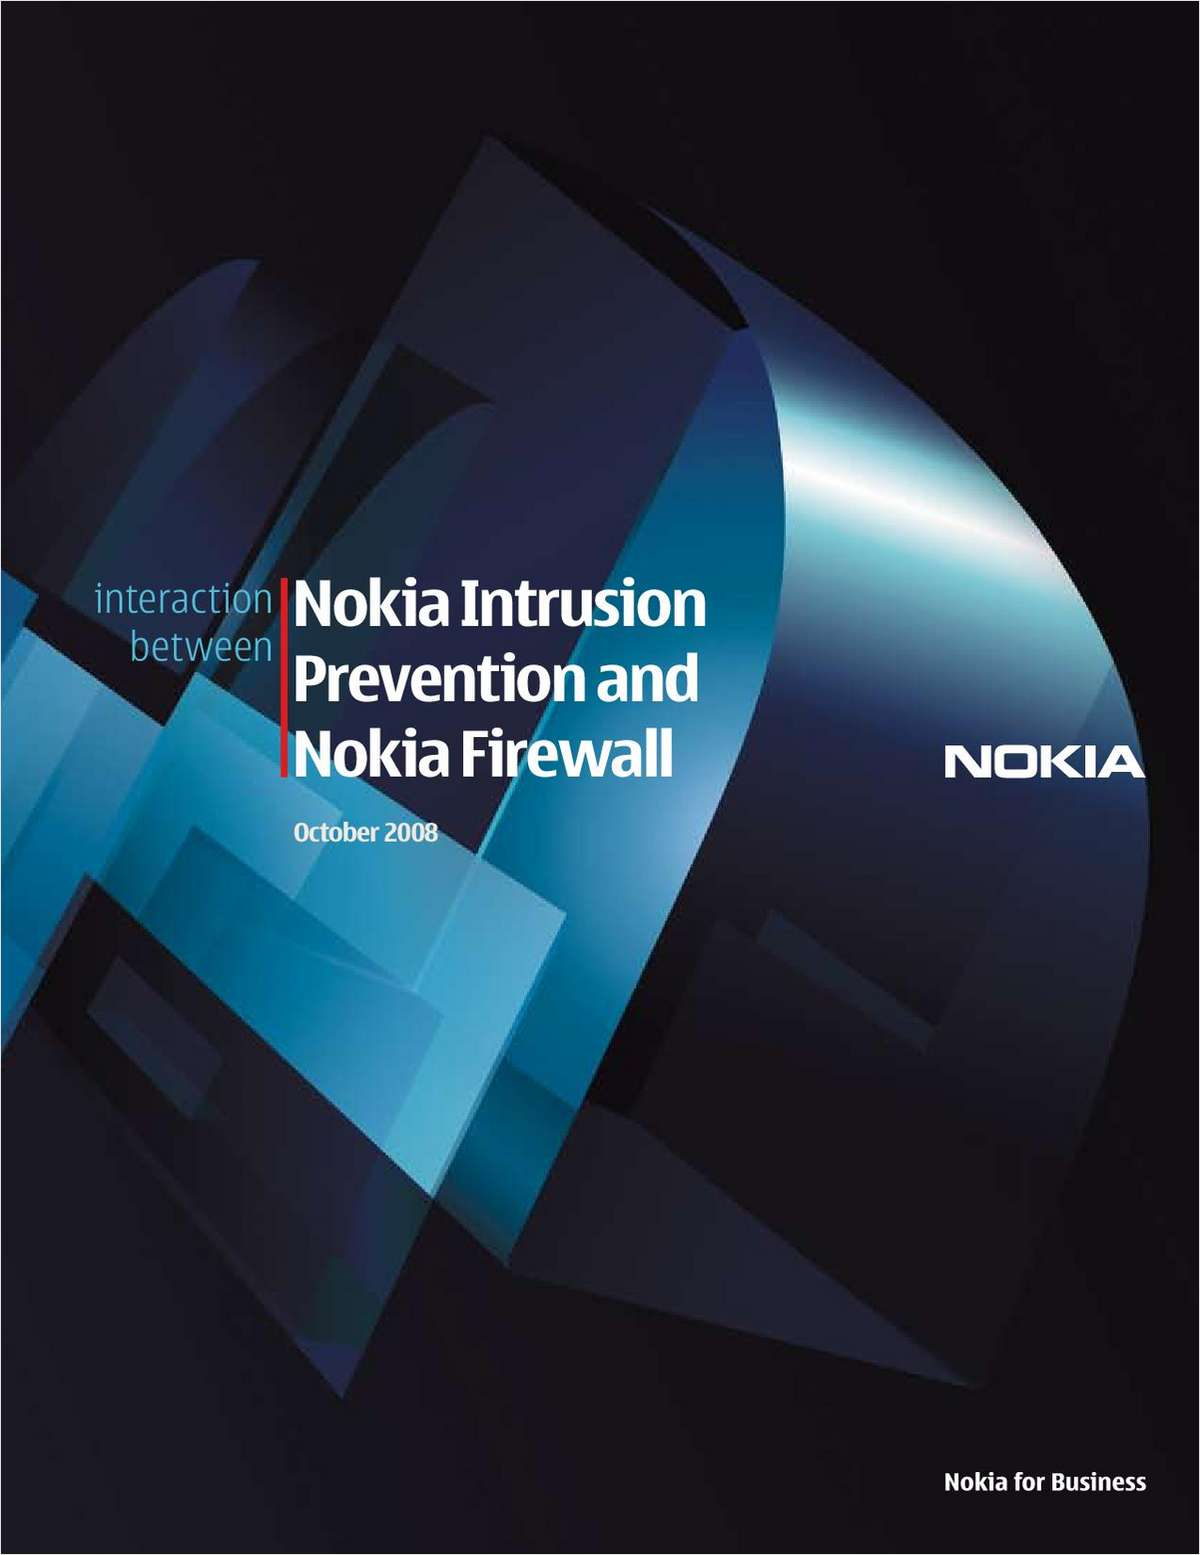 Nokia Intrusion Prevention and Nokia Firewall